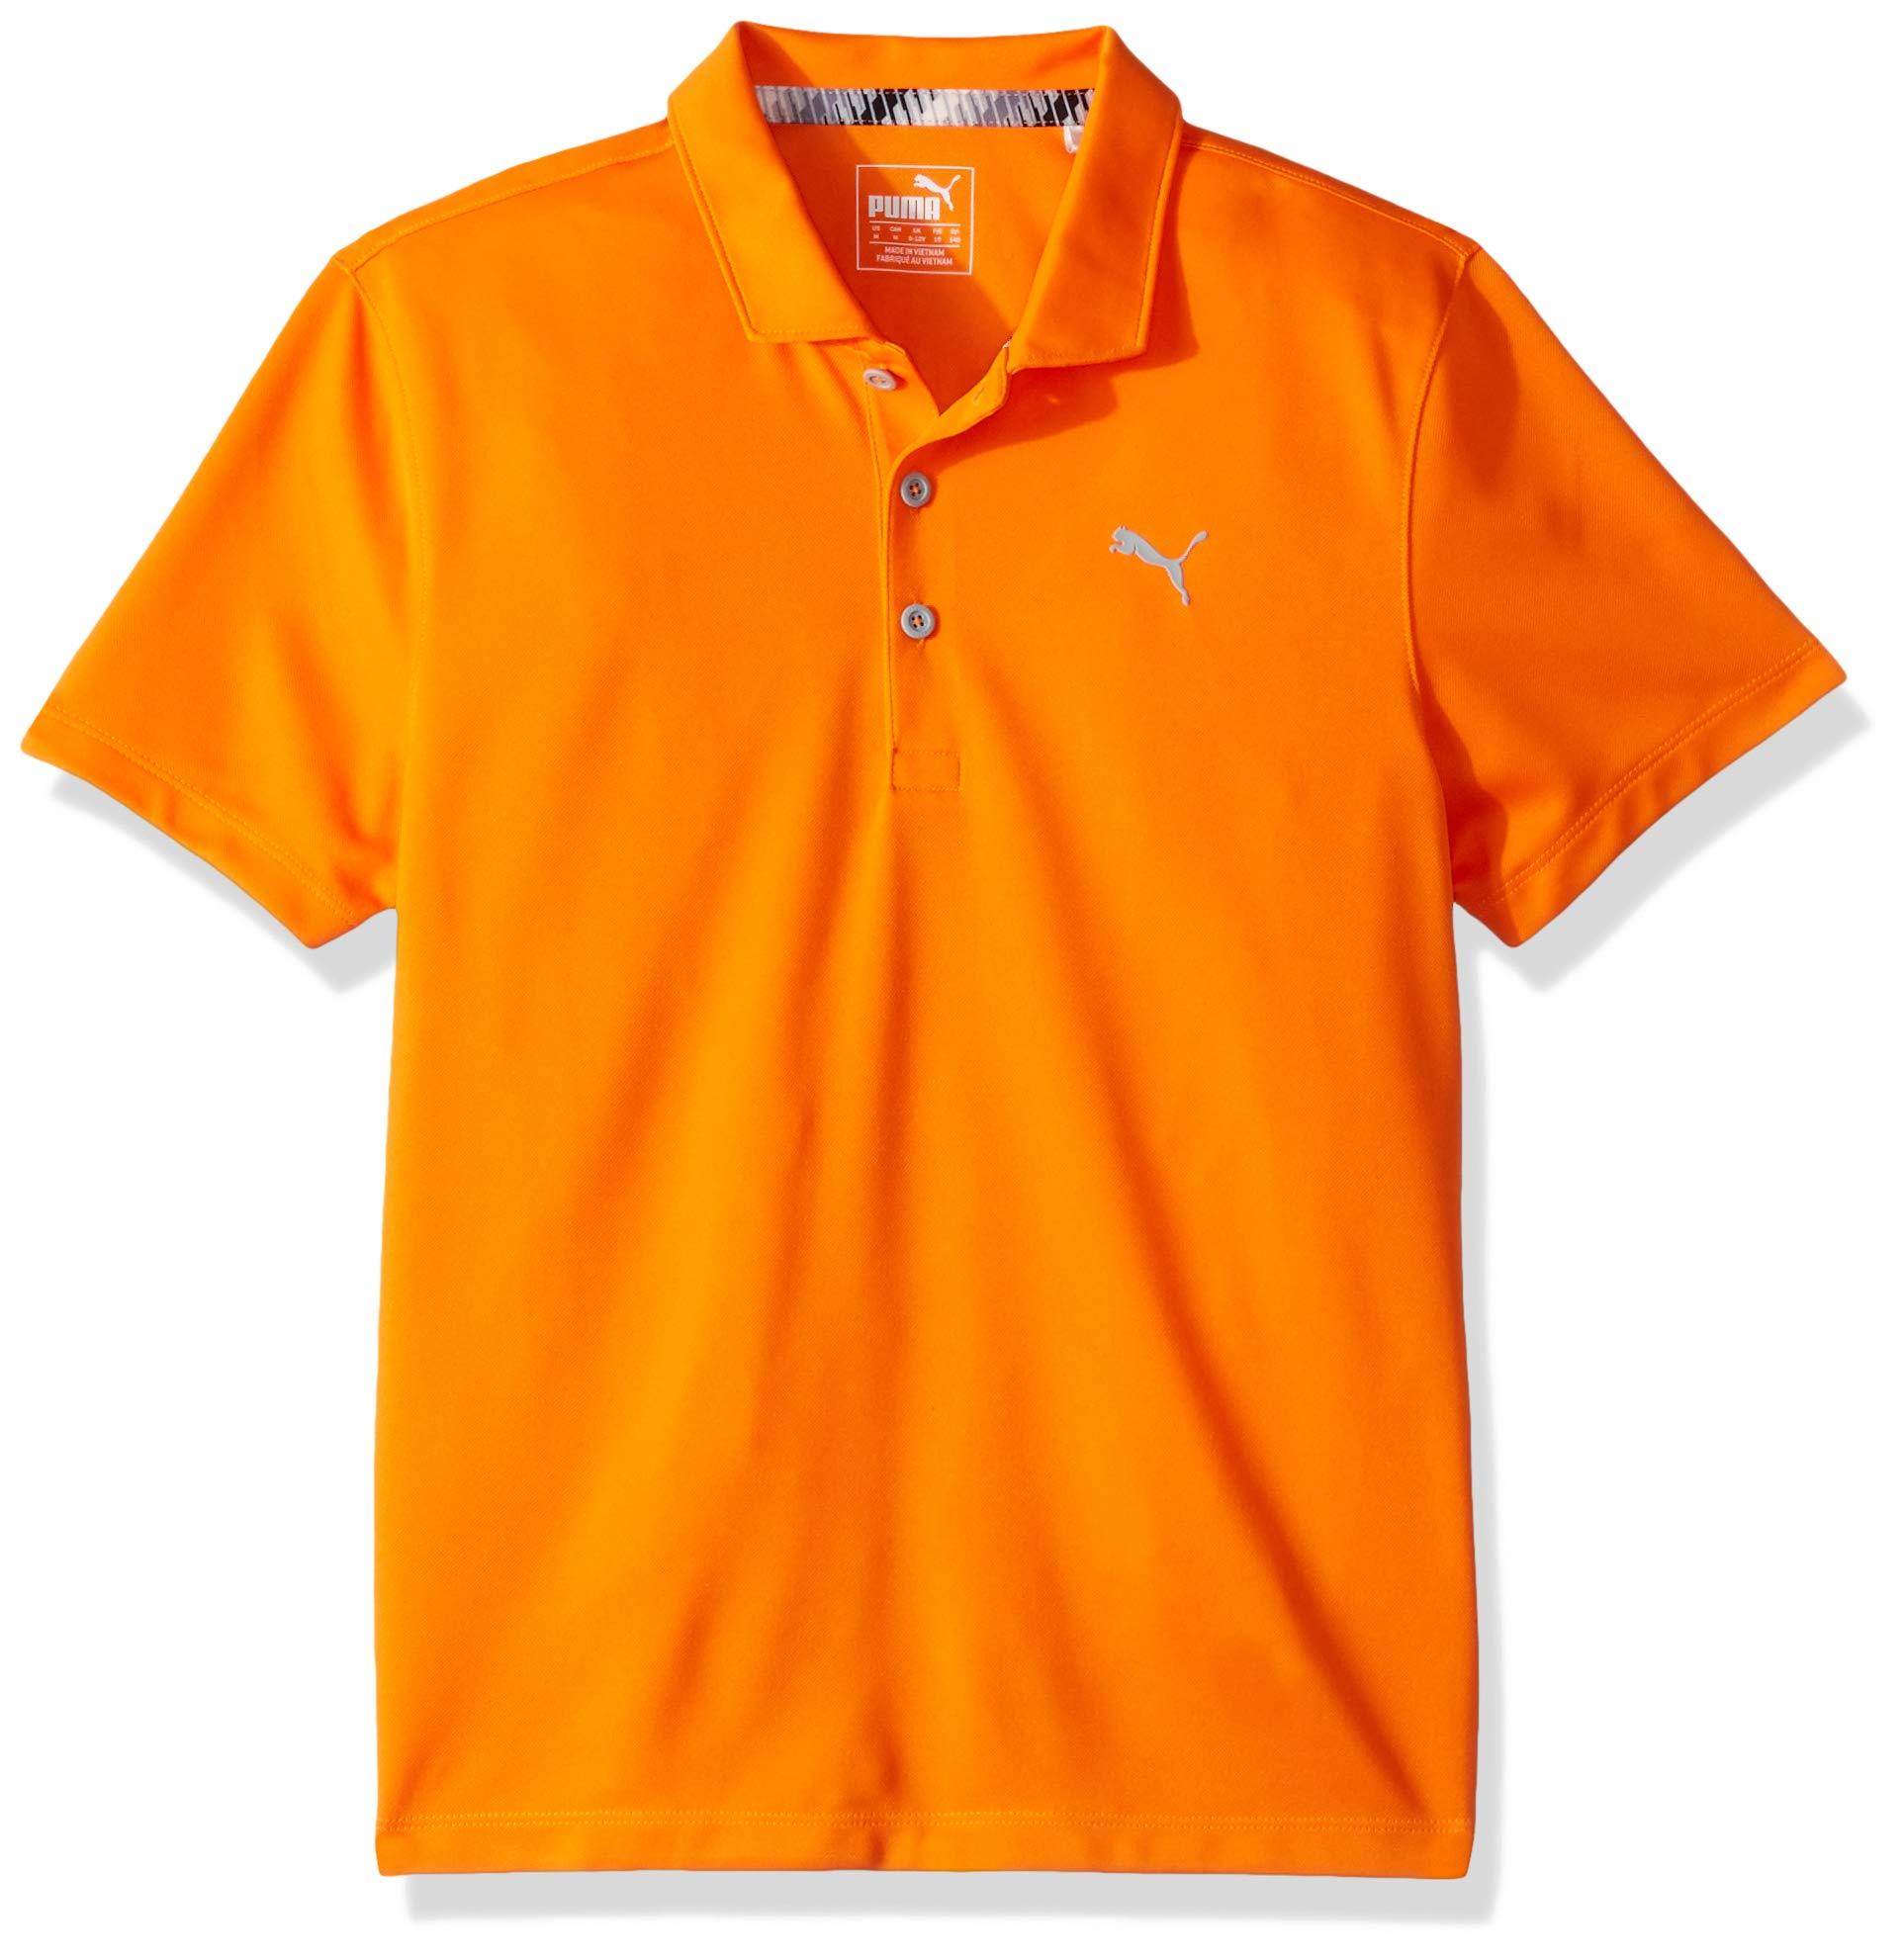 Puma Golf Boys 2019 Polo, Vibrant Orange, Small